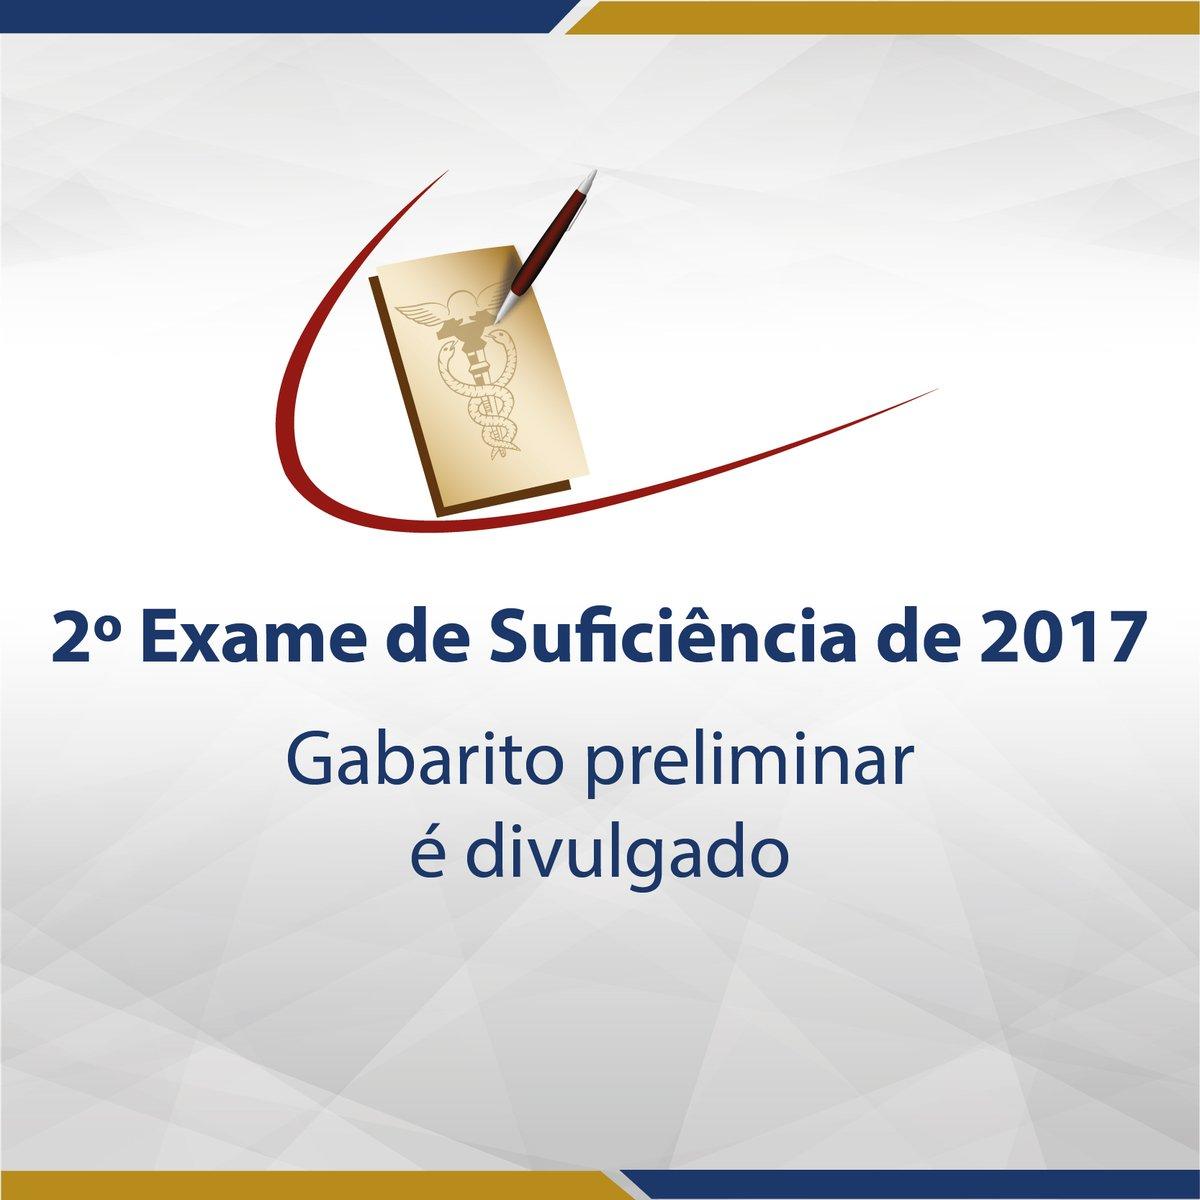 Divulgado o gabarito preliminar do 2º Exame de Suficiência de 2017